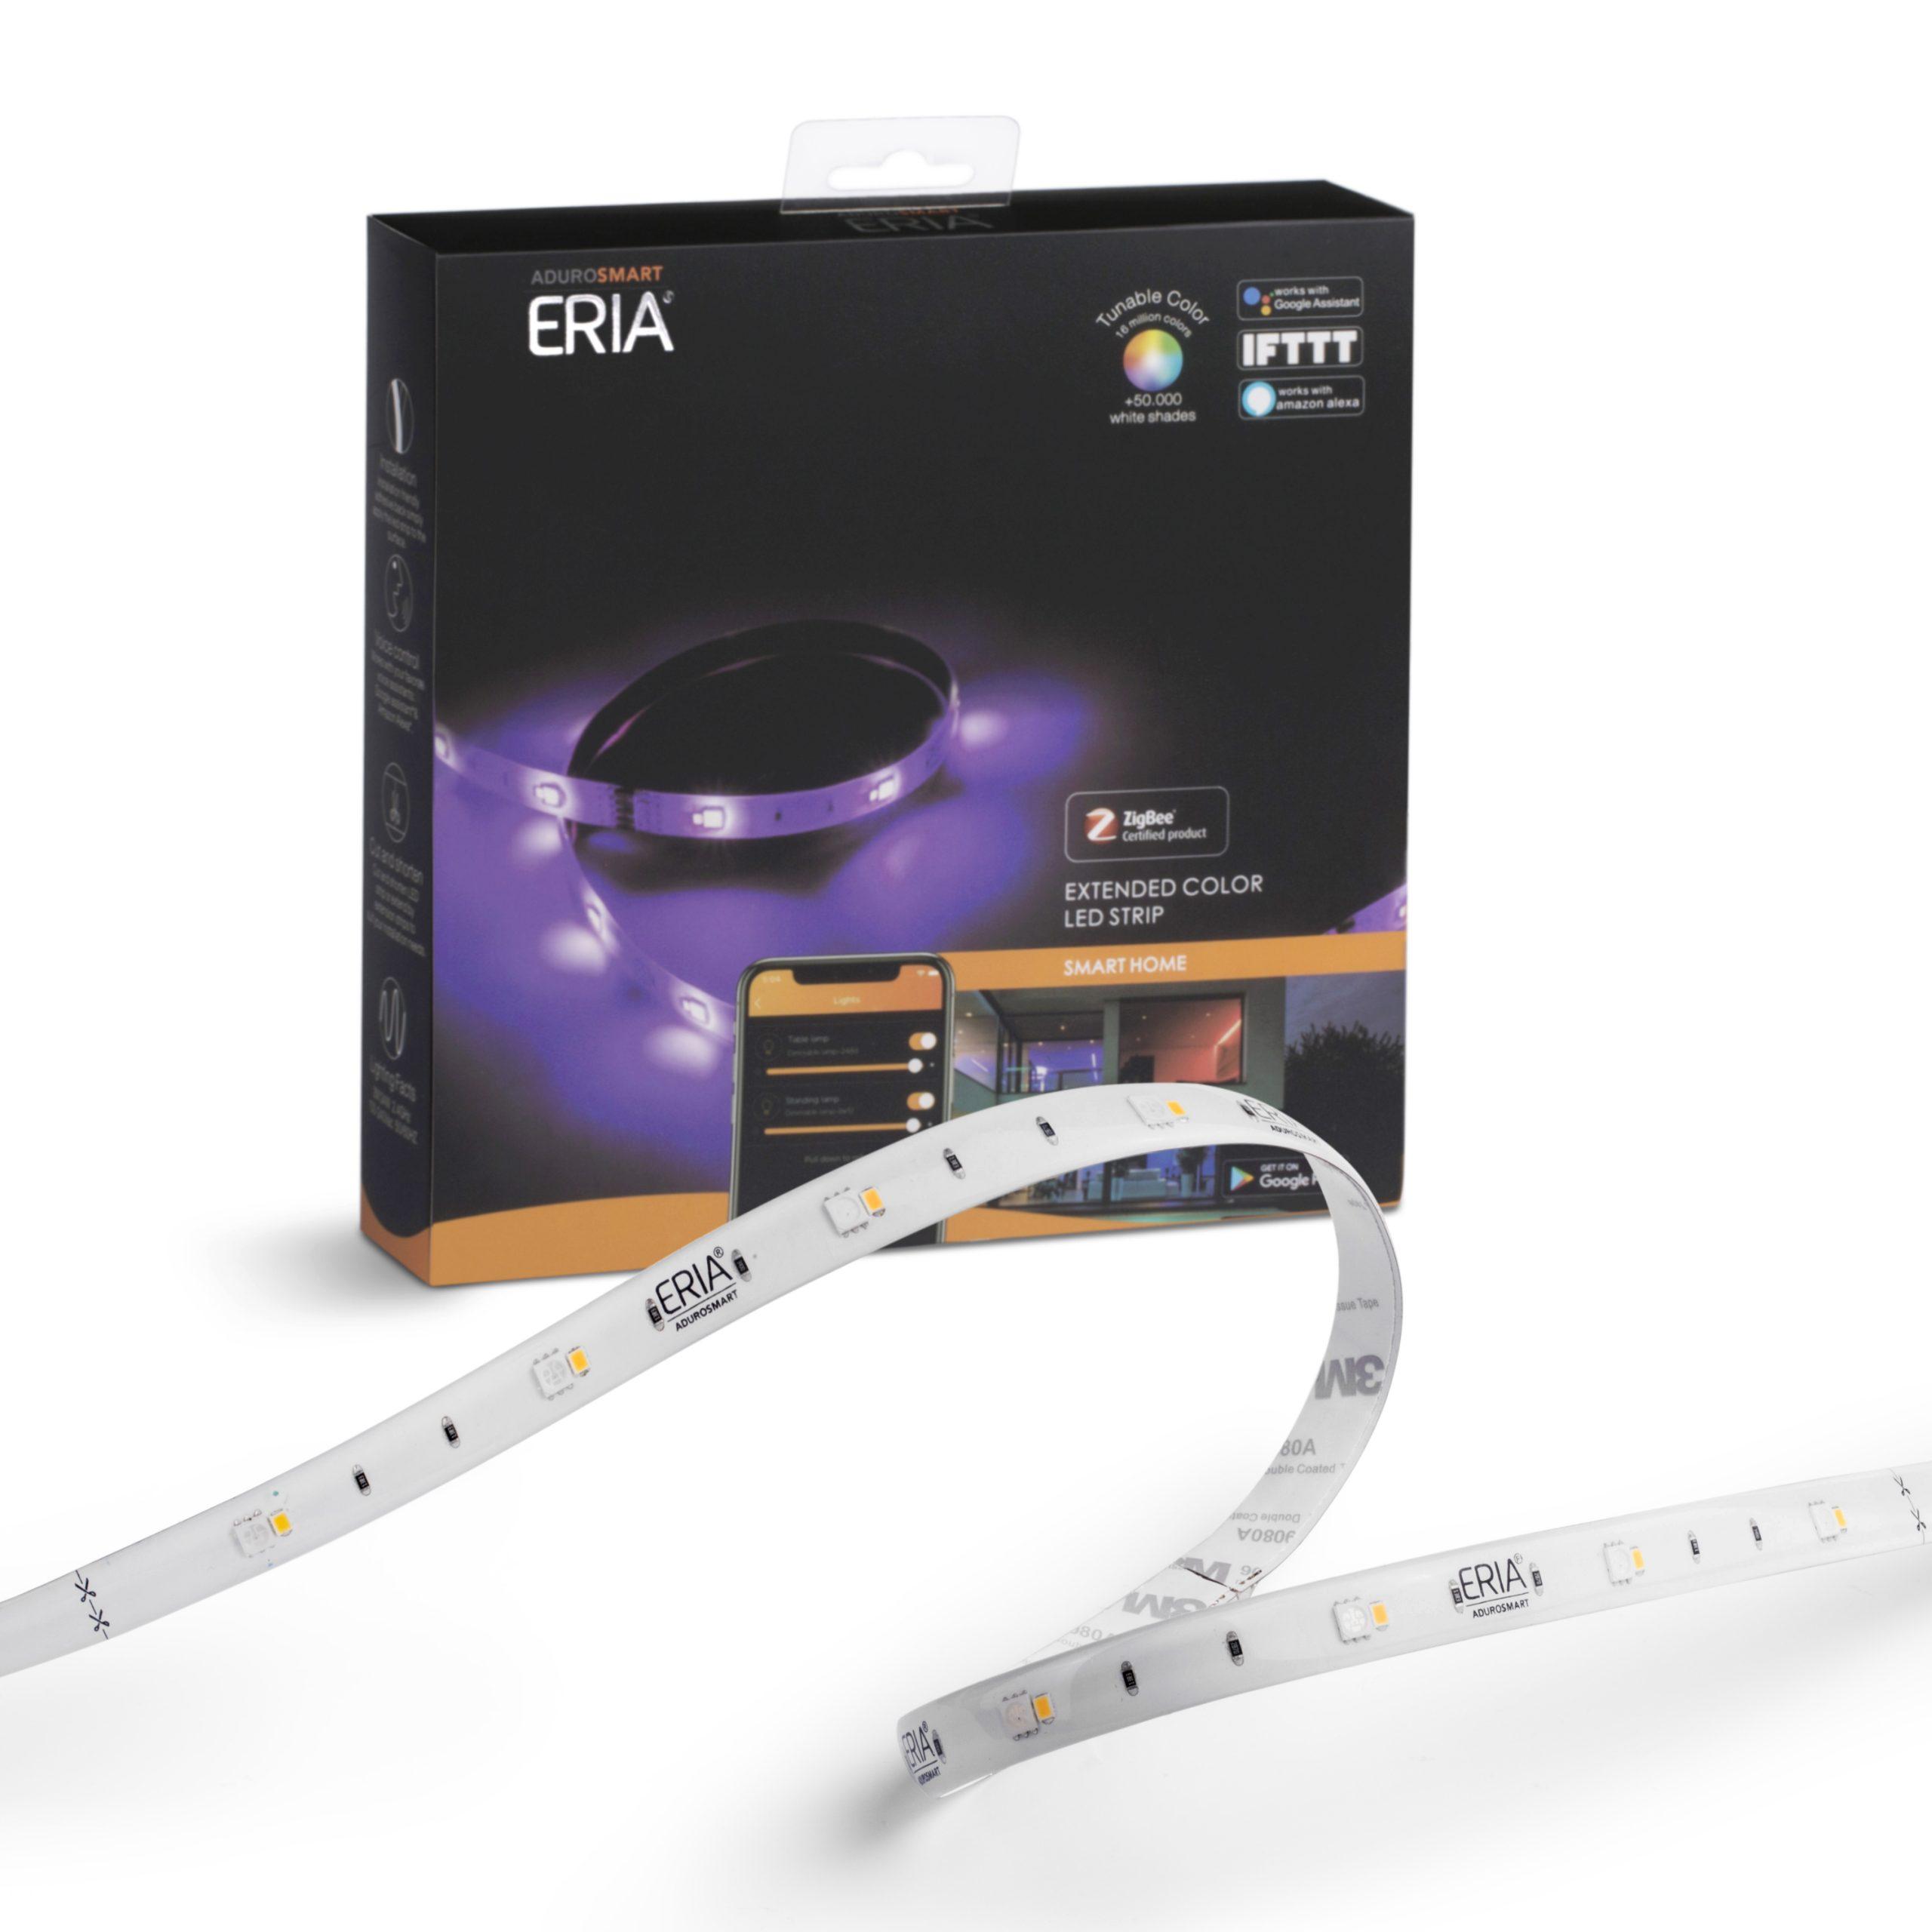 AduroSmart ERIA Flexible Extended Colors LED Strip